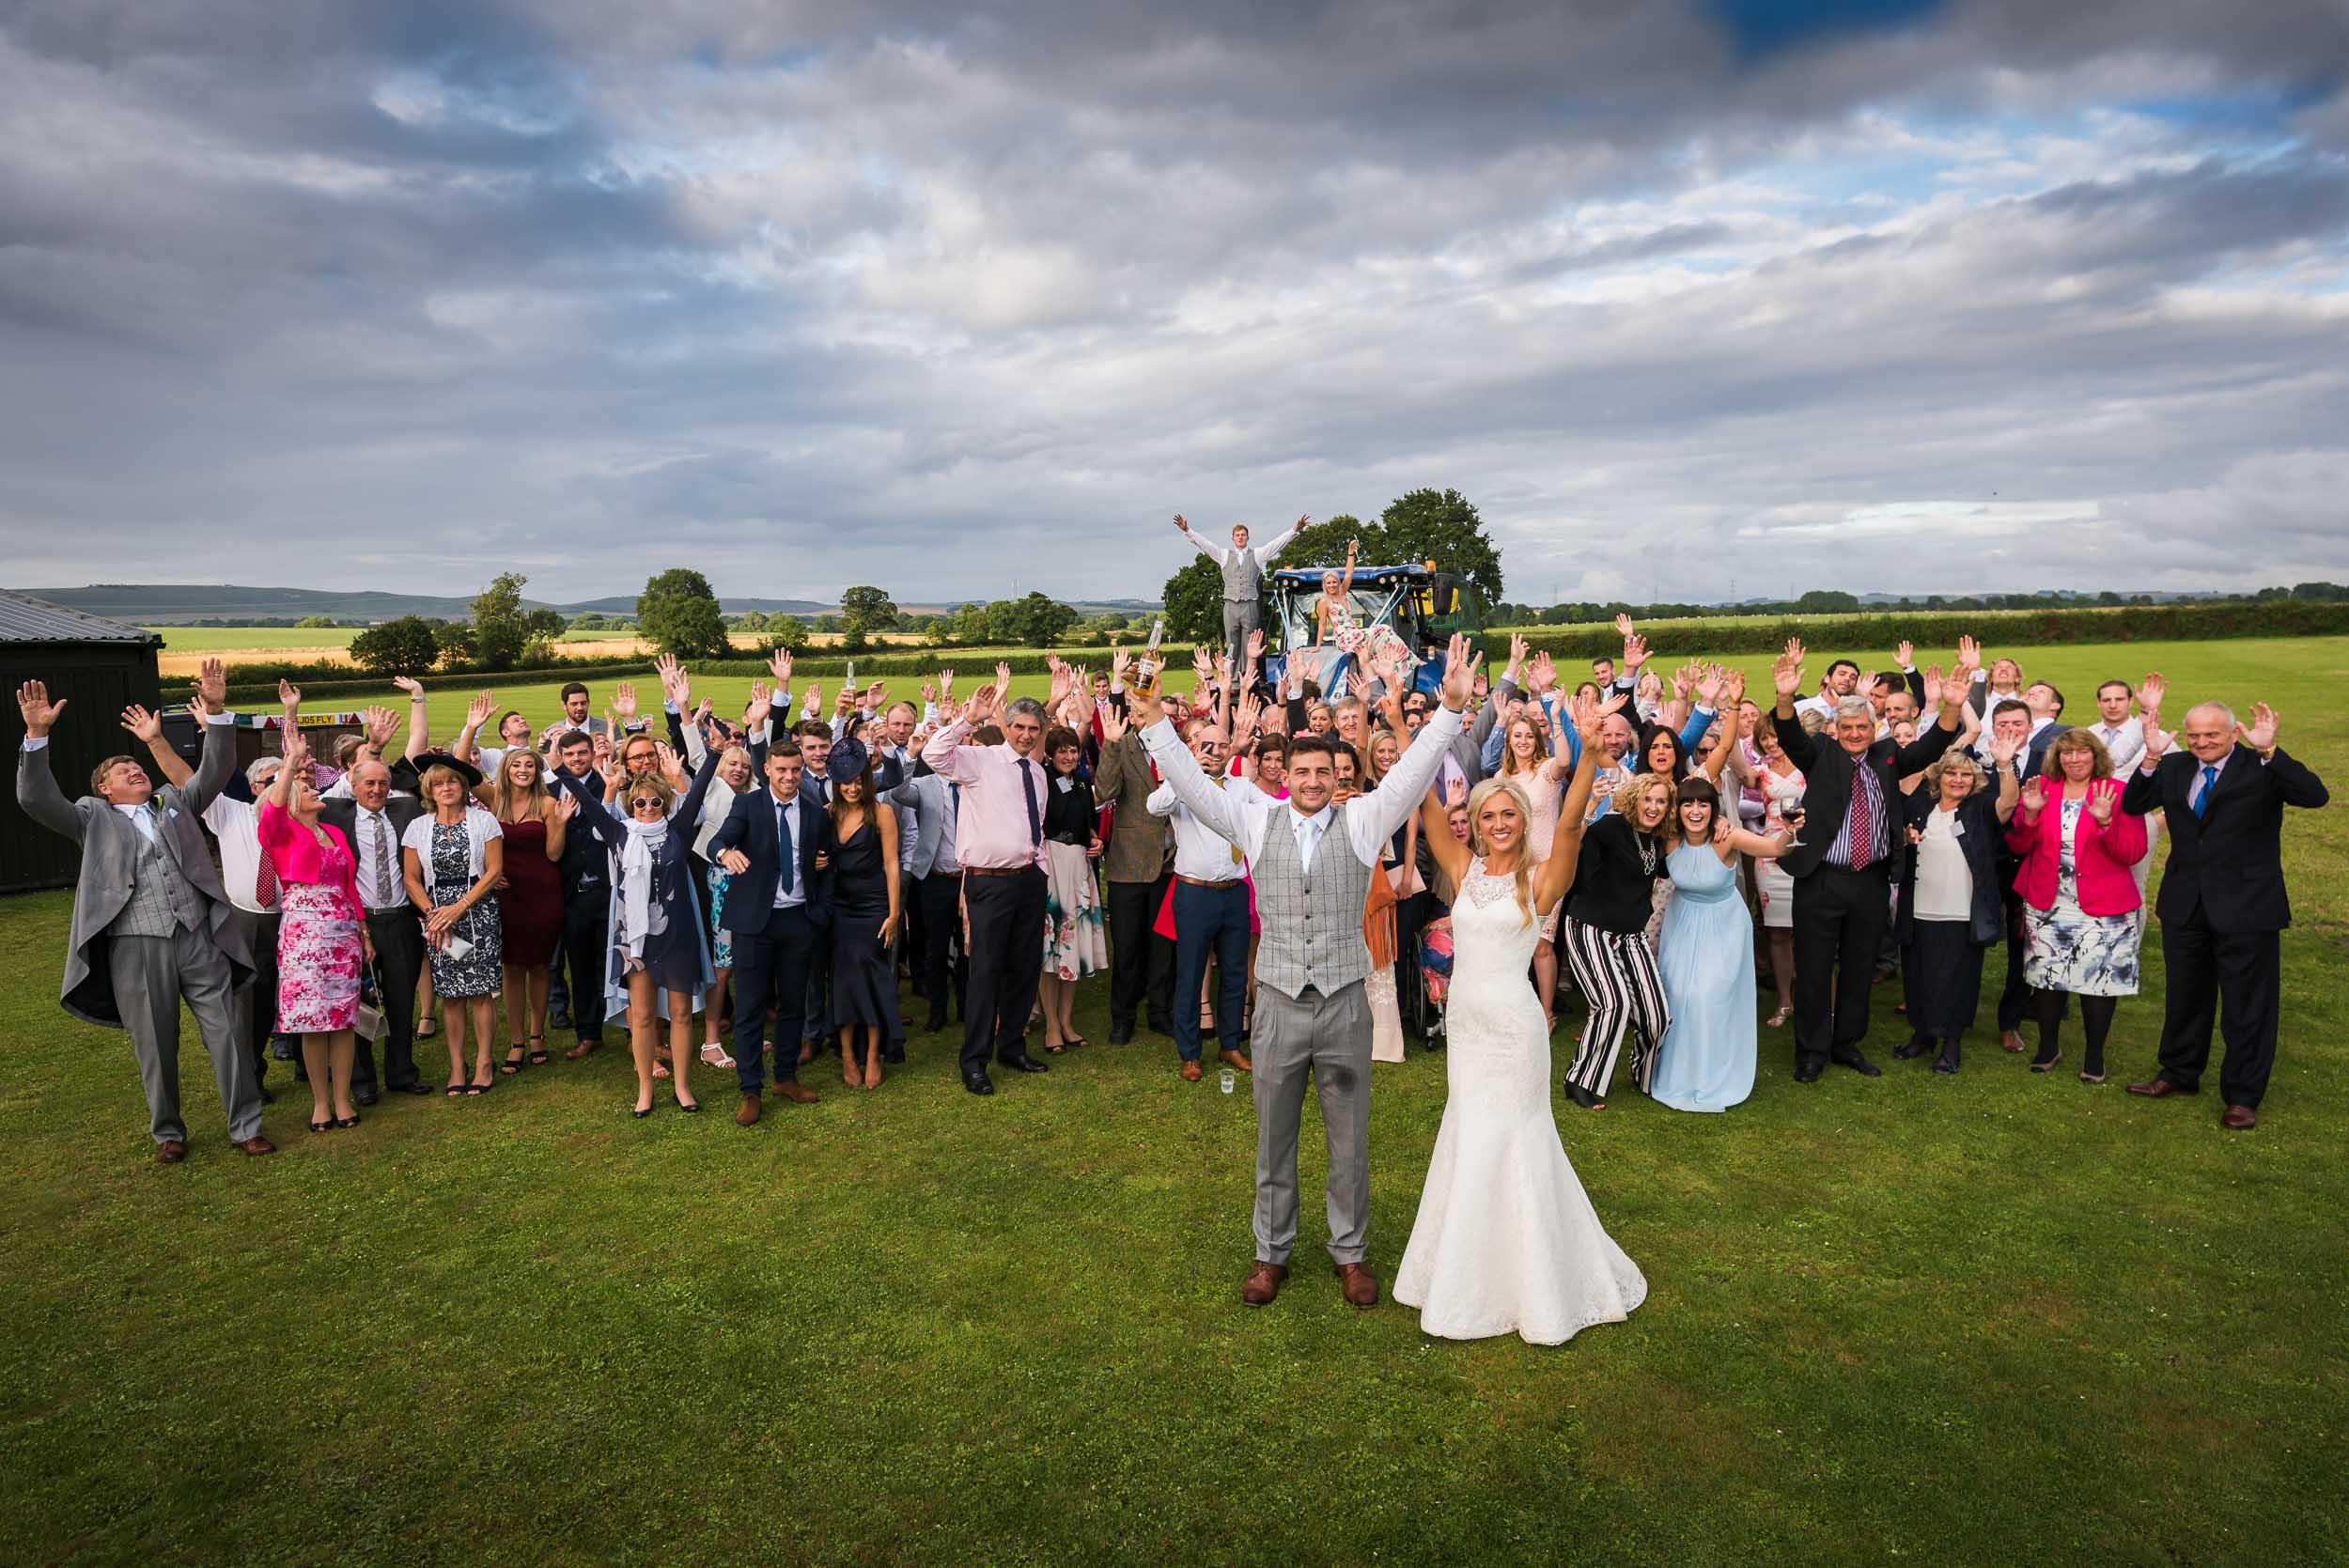 NC-20170722-sophie-and-jonny-wedding-0830.jpg